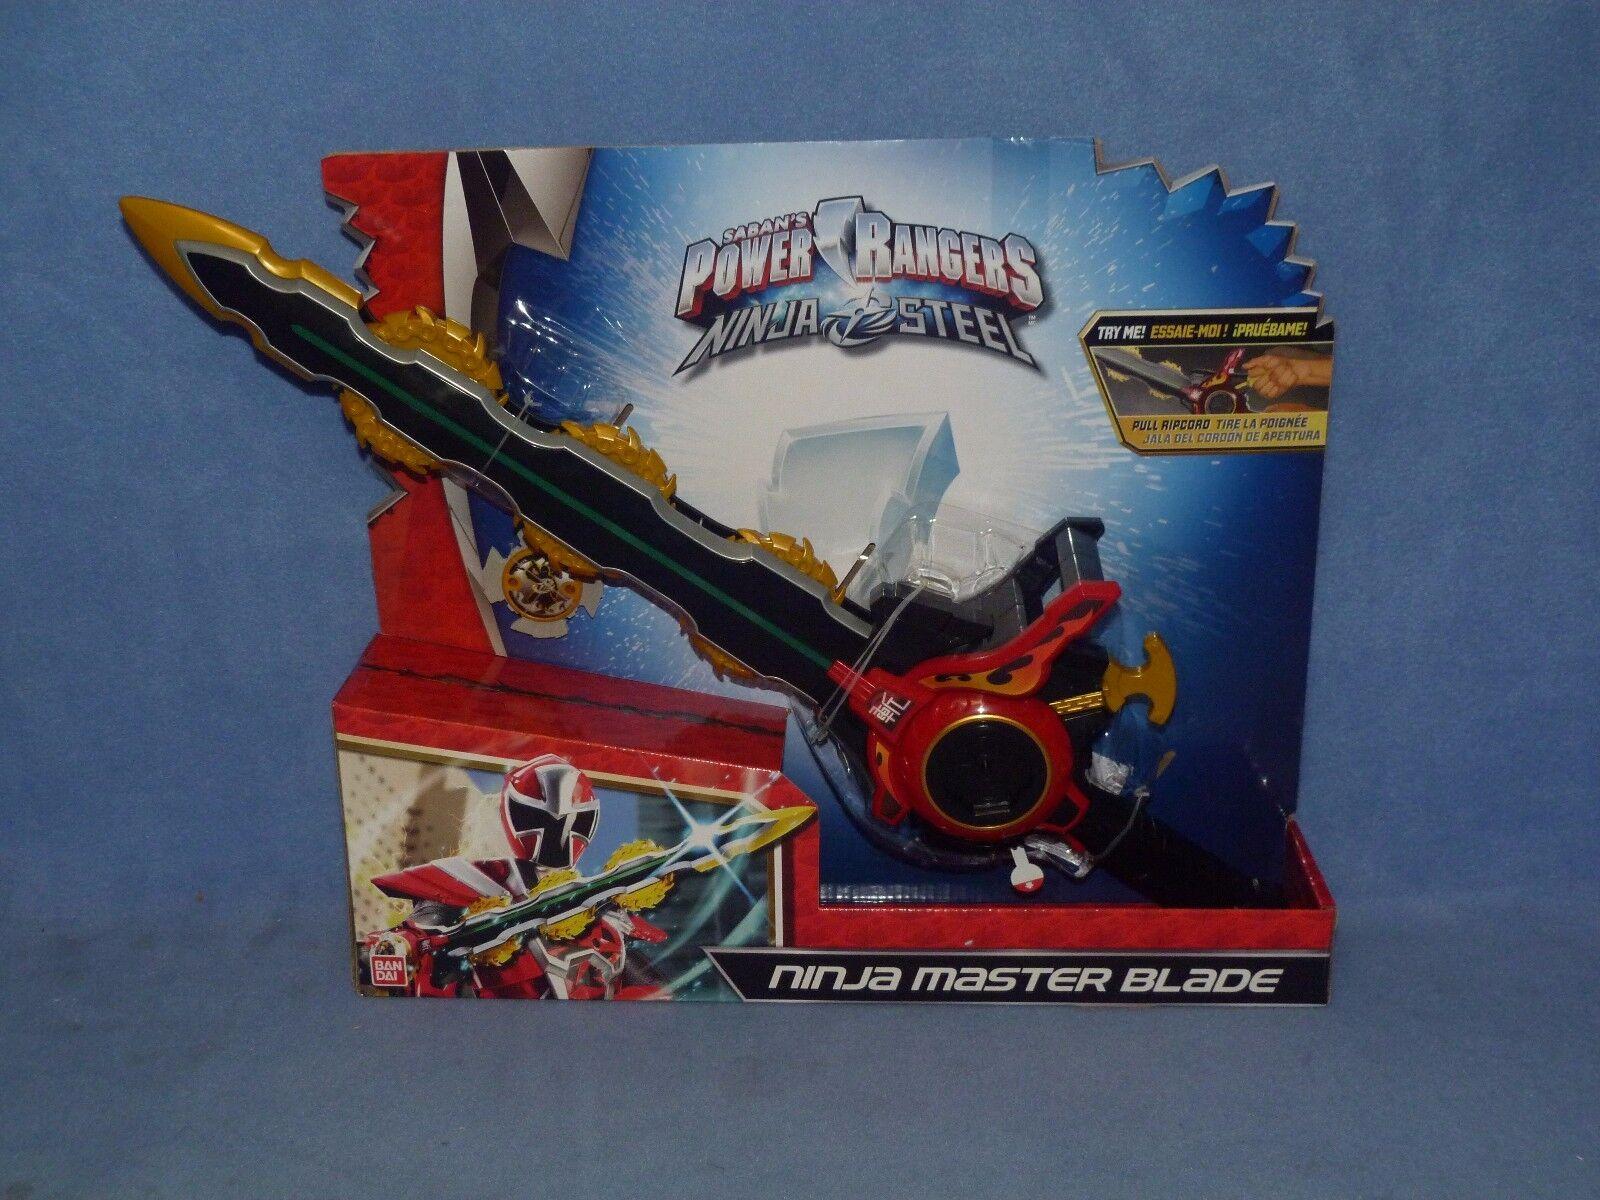 POWER Rangers Ninja acciaio-Lama Ninja Master * Nuovo di Zecca *